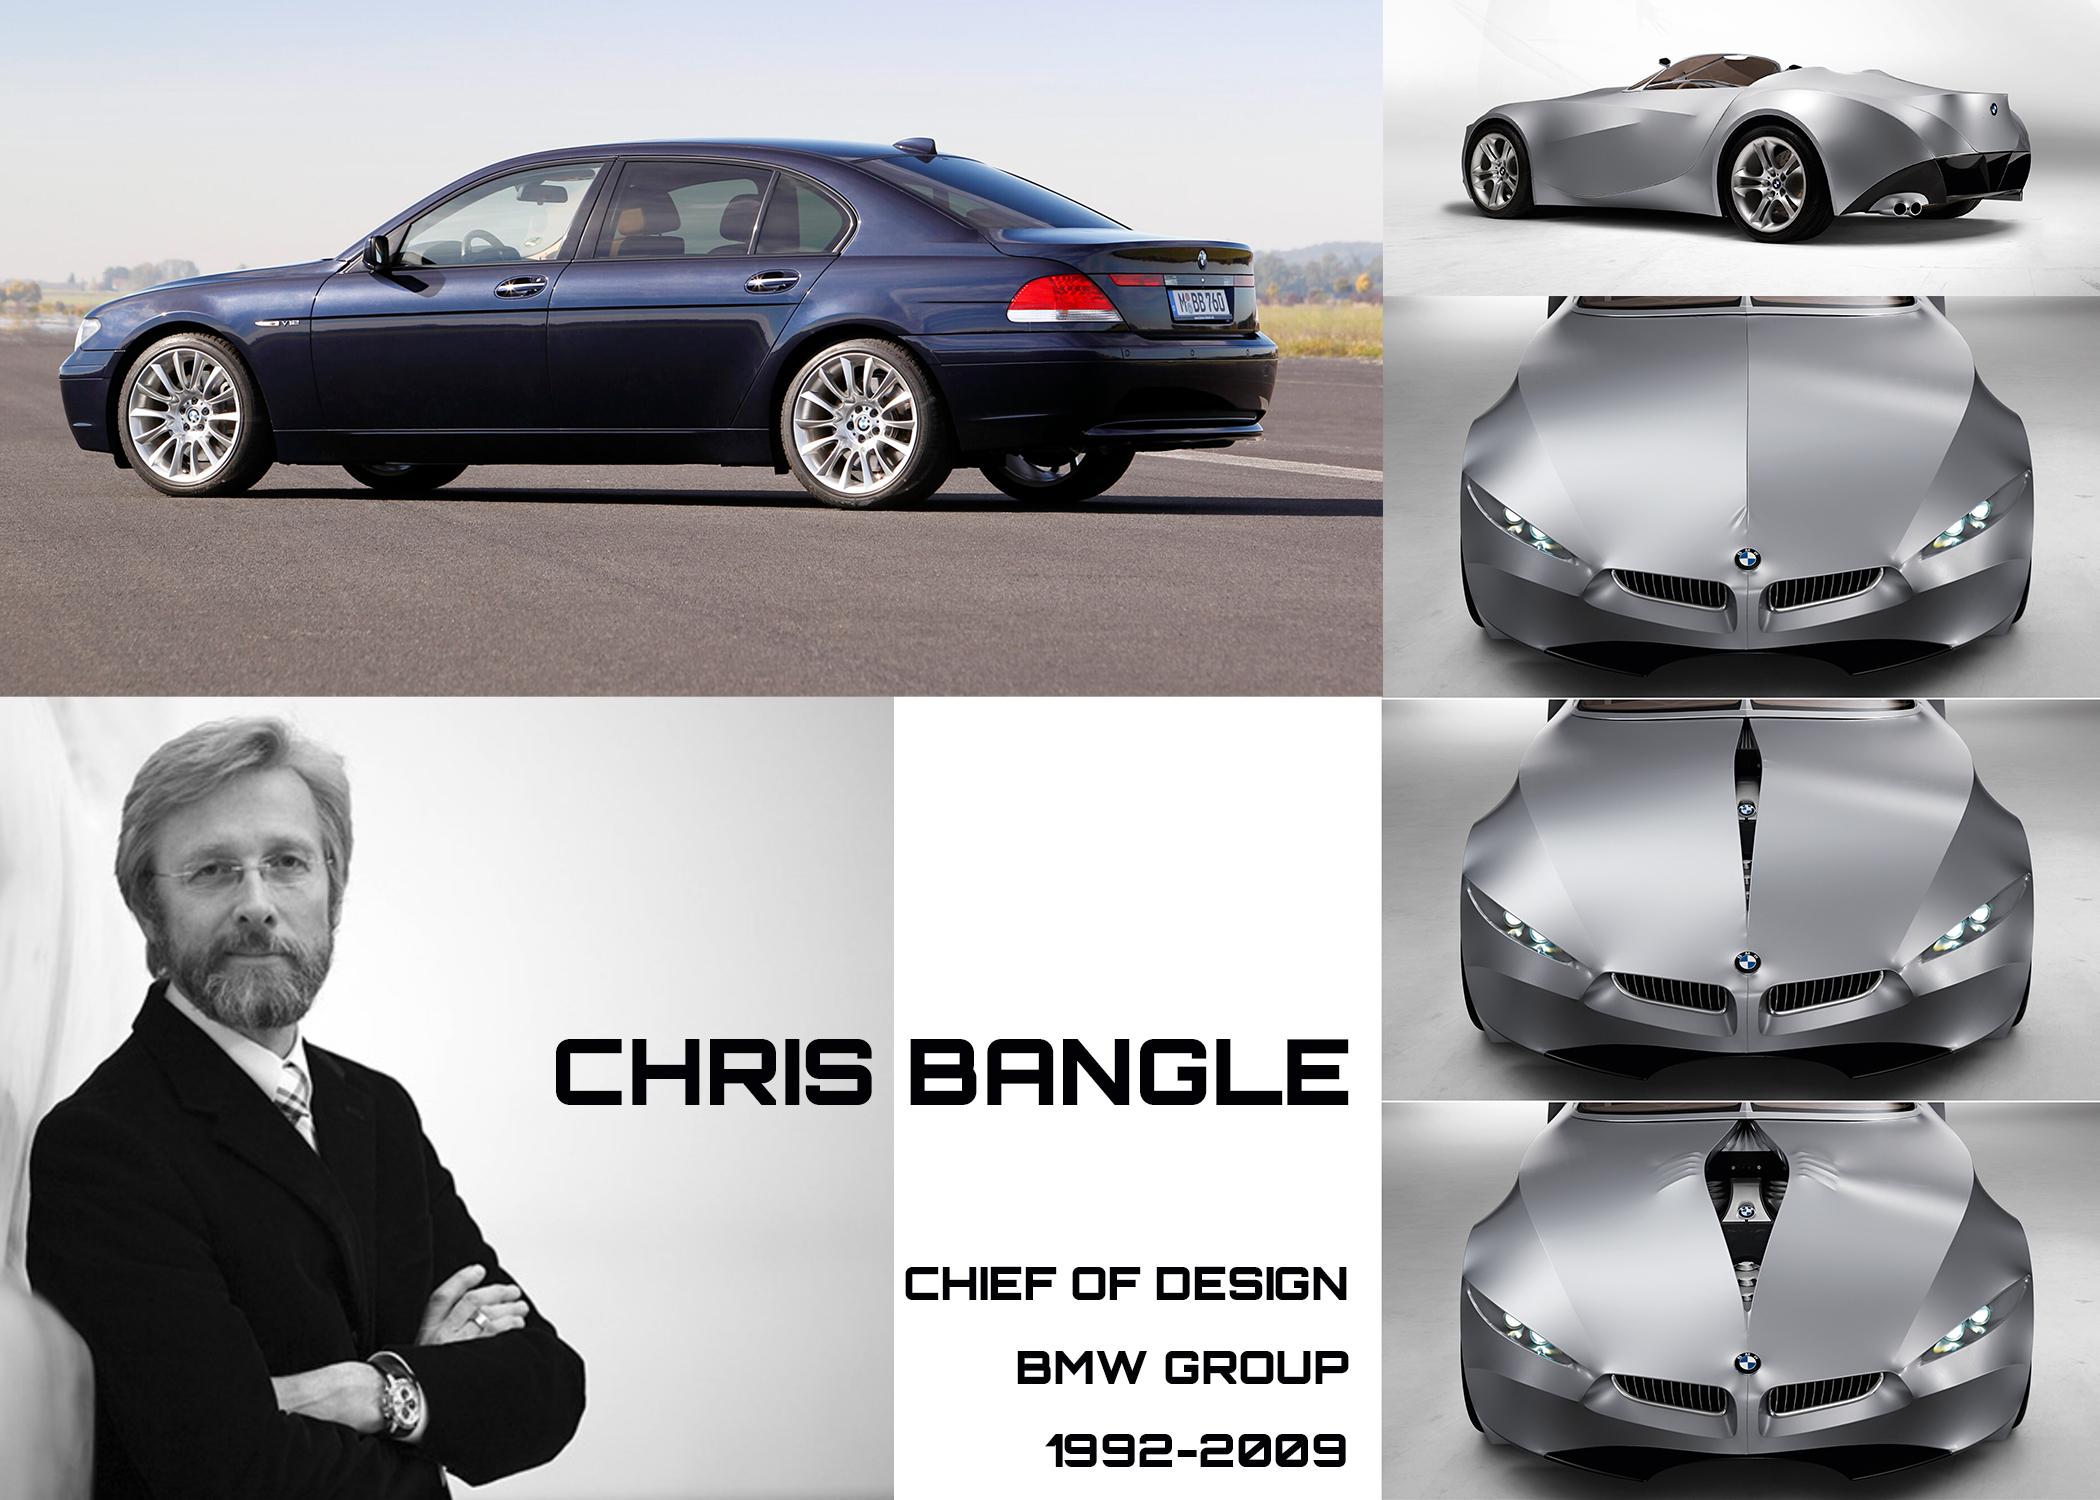 ChrisBangle